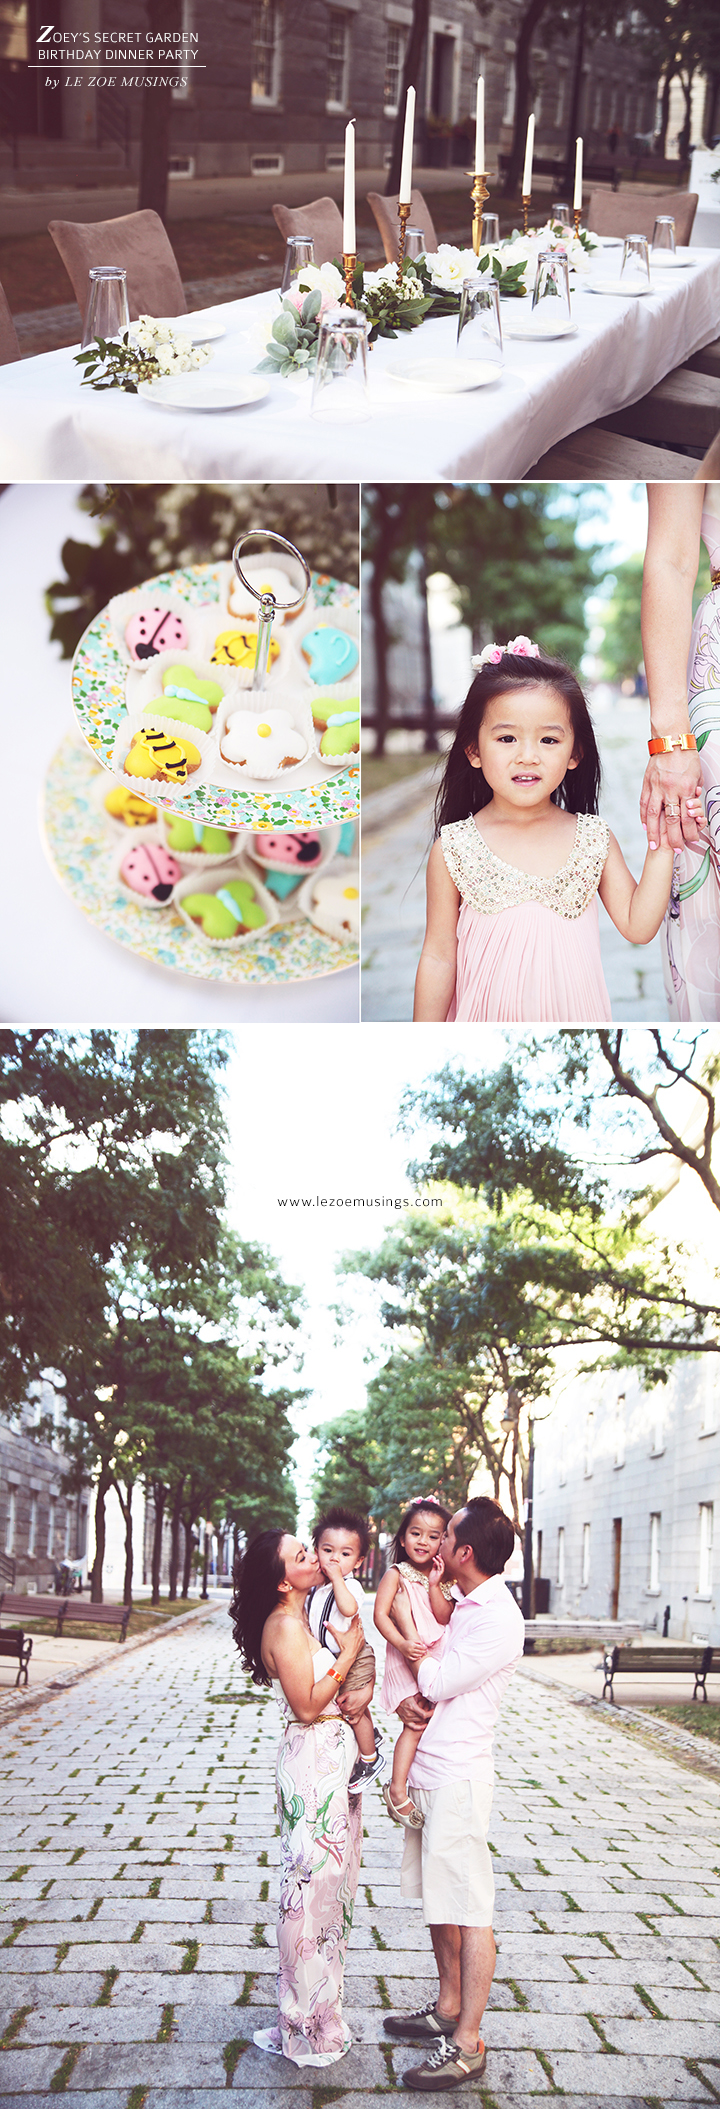 Secret Garden Birthday Party by Le Zoe Musings 3